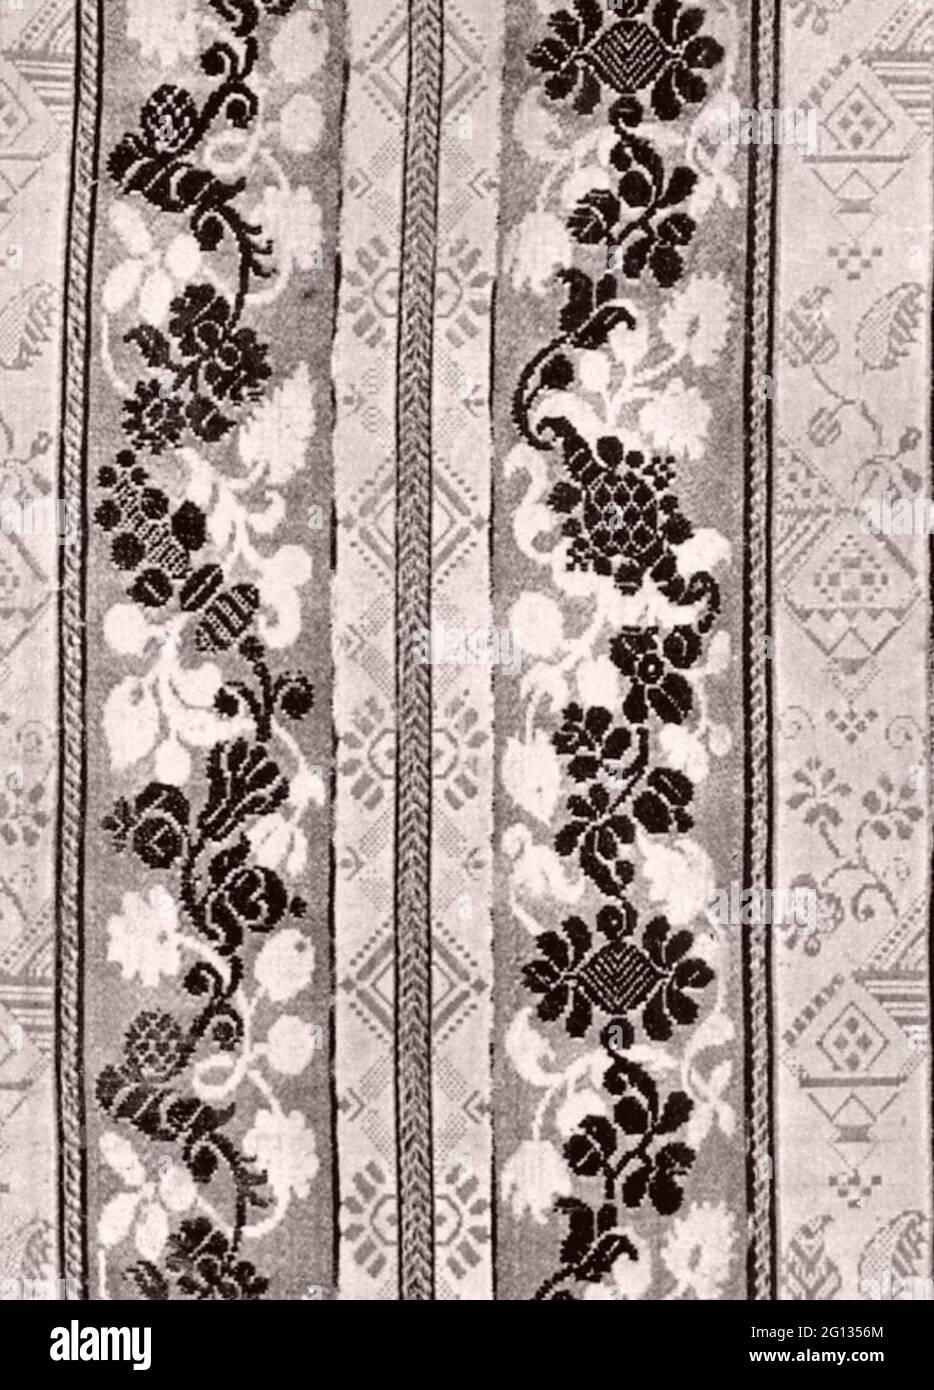 Fragment - Ende des 17. Jahrhunderts - Frankreich brokatierter Satindamast. 1675 - 1700. Stockfoto